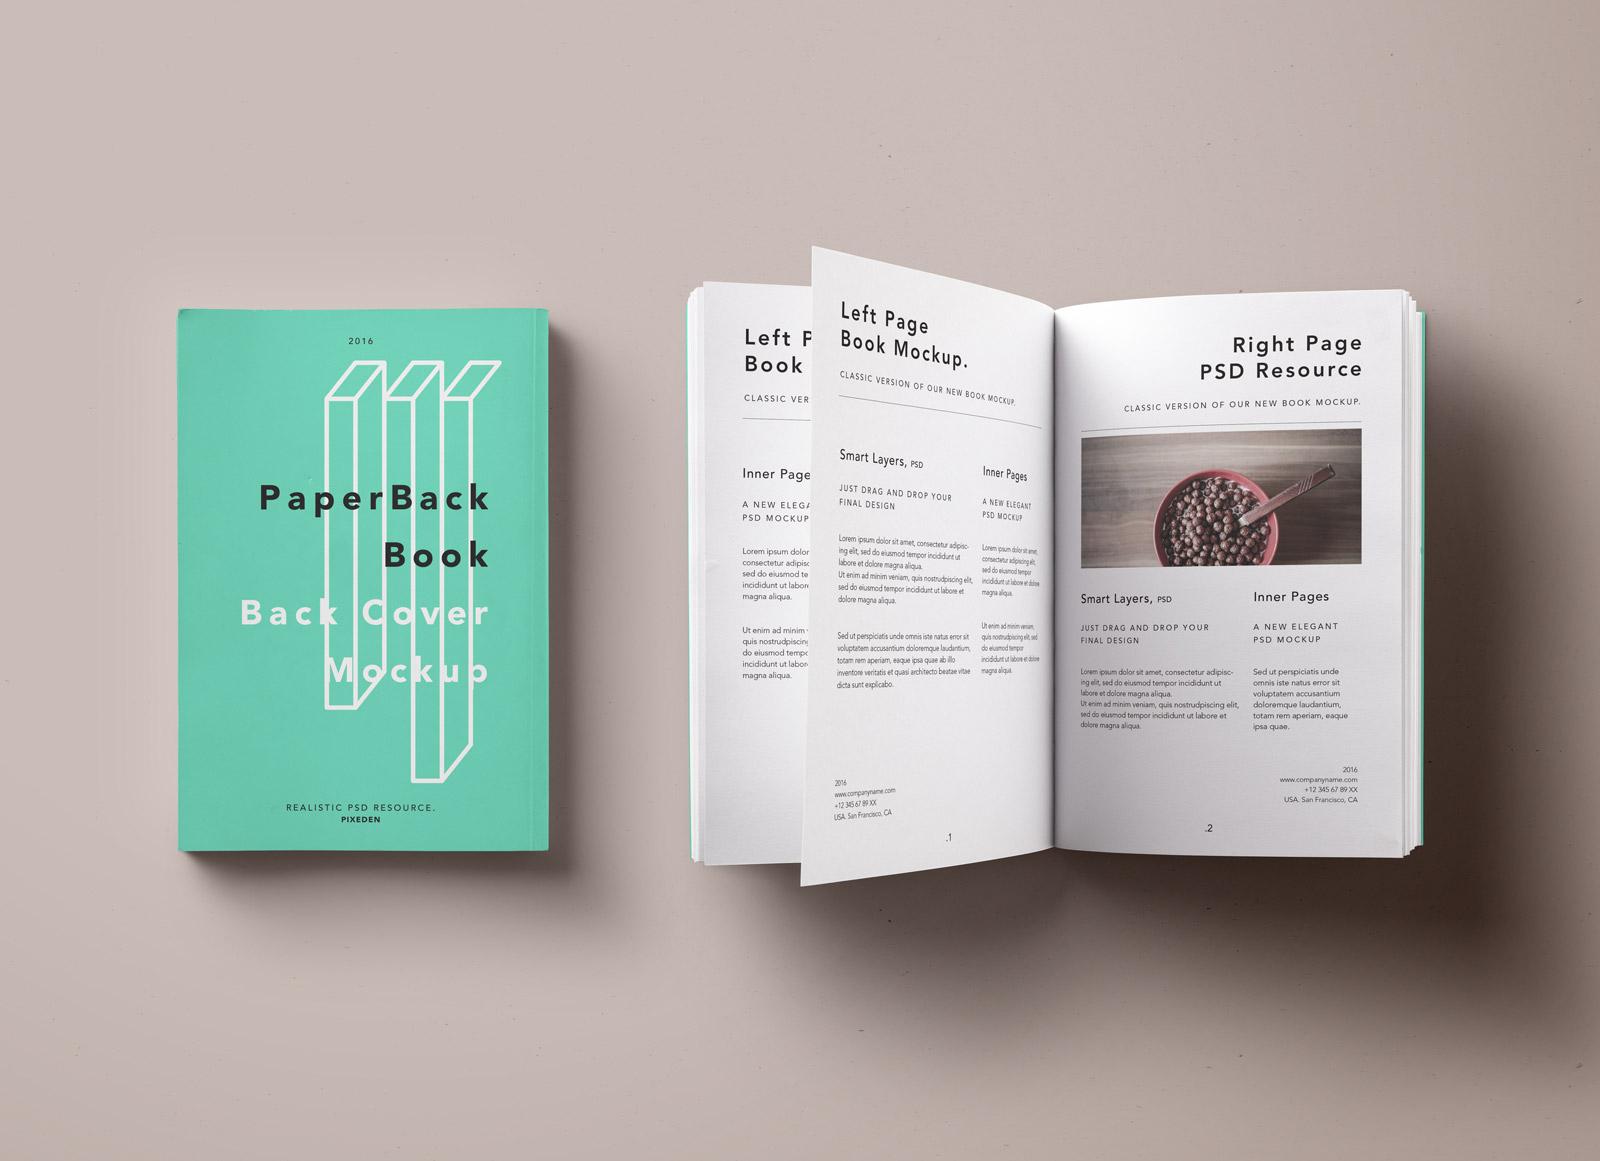 Free Paperback Book Amp Inner Pages Mockup PSD Good Mockups